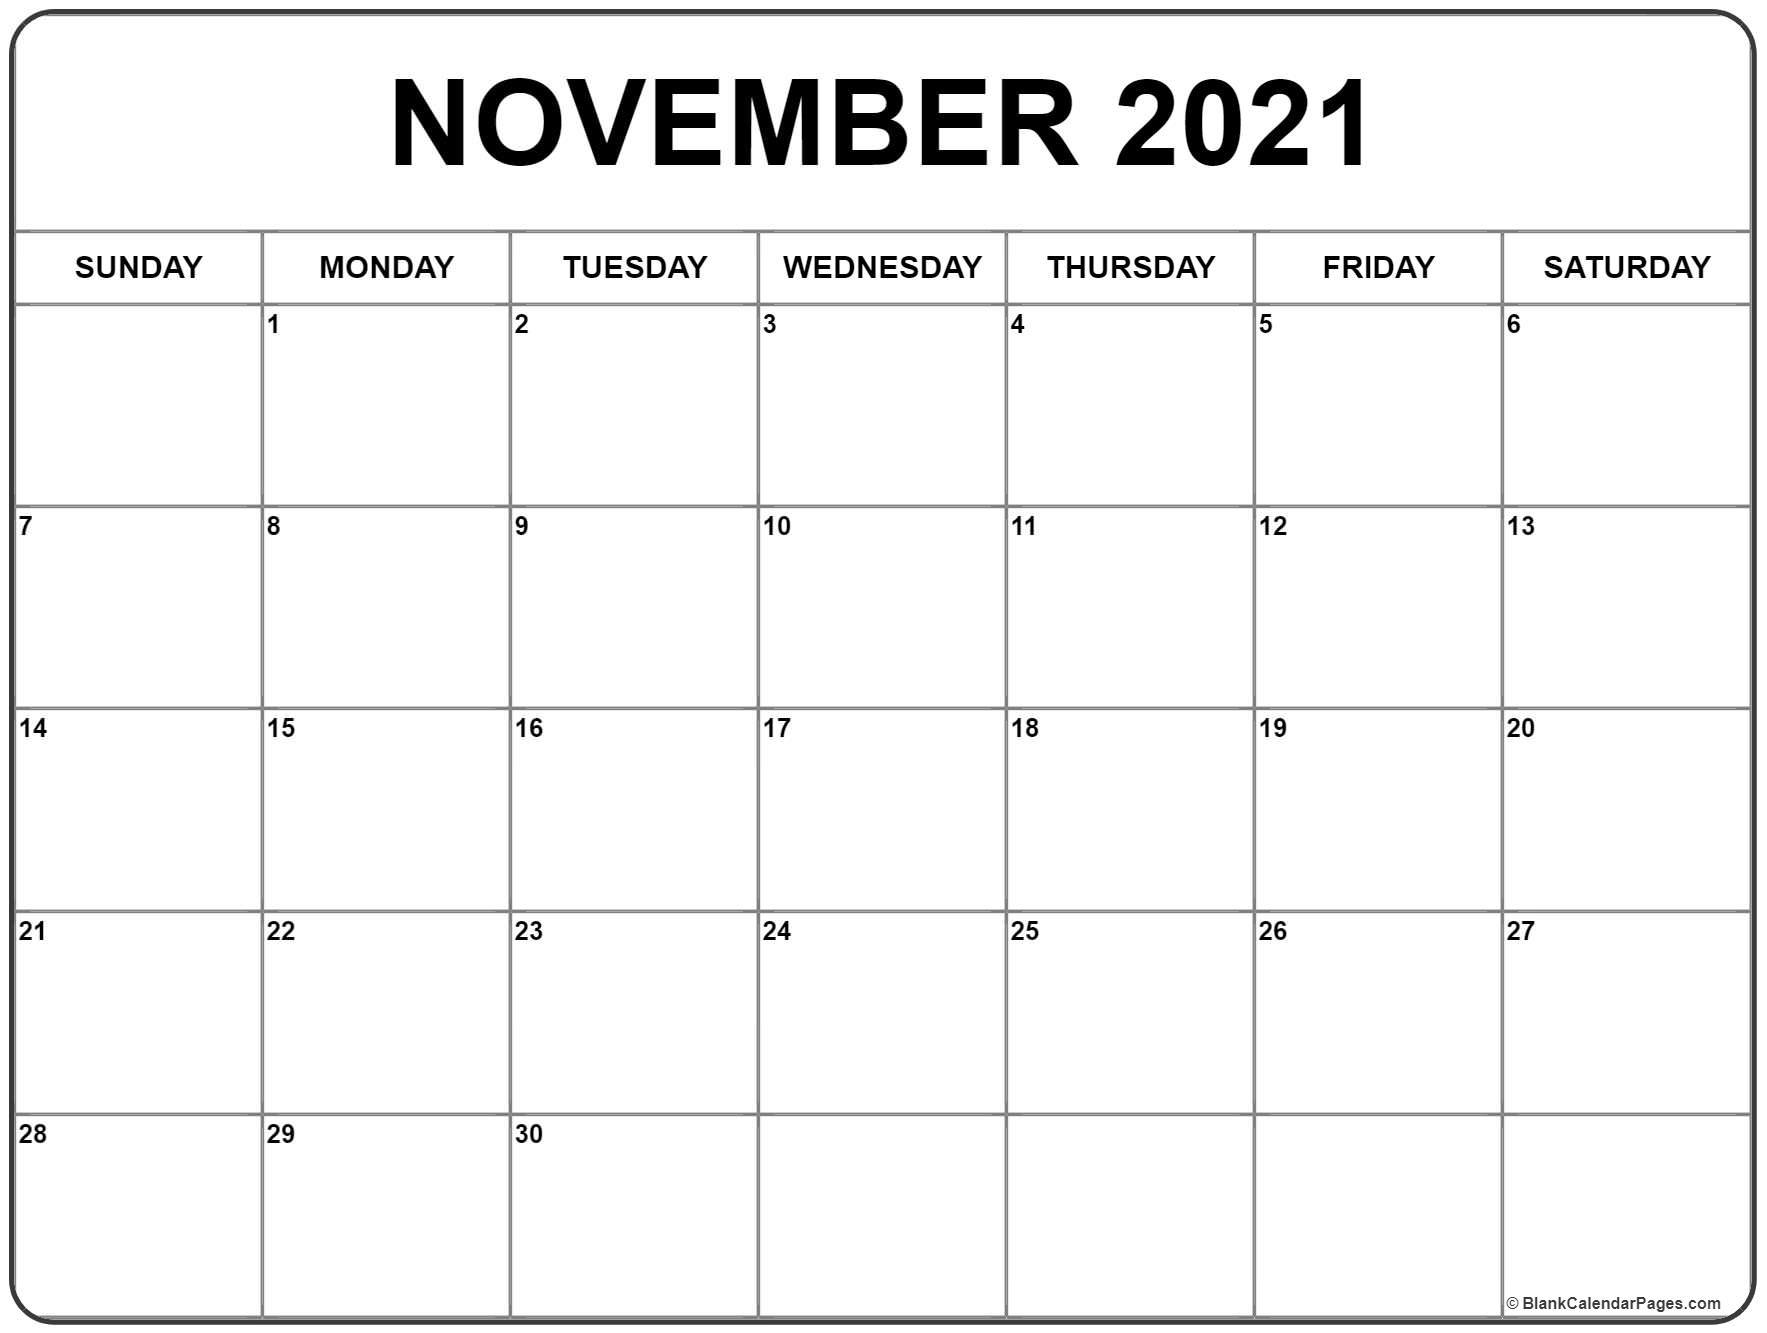 November 2021 Calendar   Free Printable Monthly Calendars with Calendar 2021 November Fill In